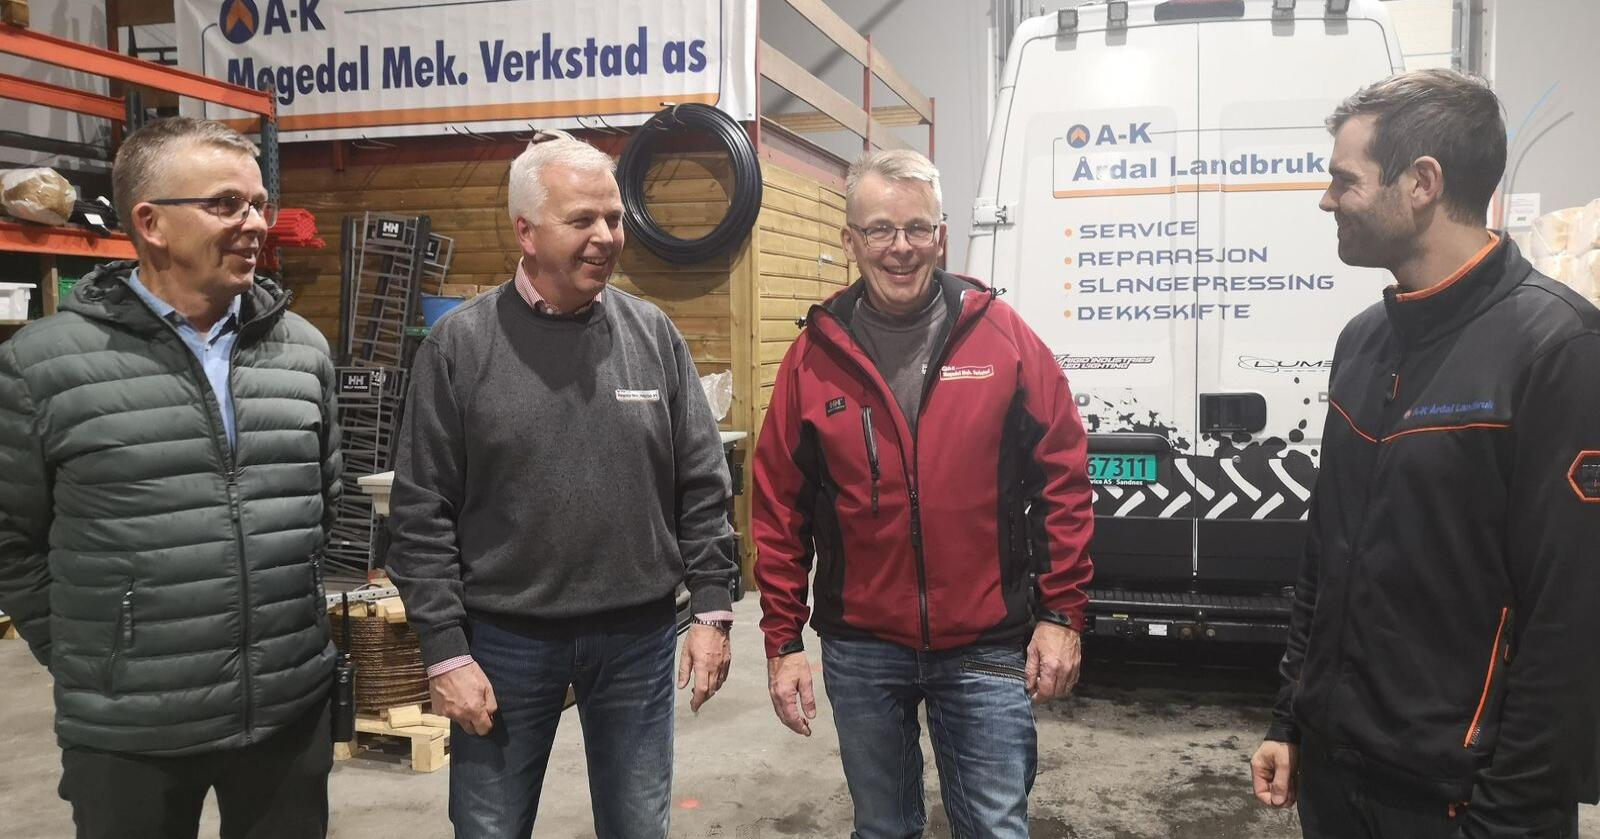 Sterkare saman: Werner Bakka, dagleg leiar i Møgedal, Leif Bakka, Geir Bakka og dagleg leiar i Årdal Landbruk, Stian Vadla. Foto: Judith Sørhus Litlehamar